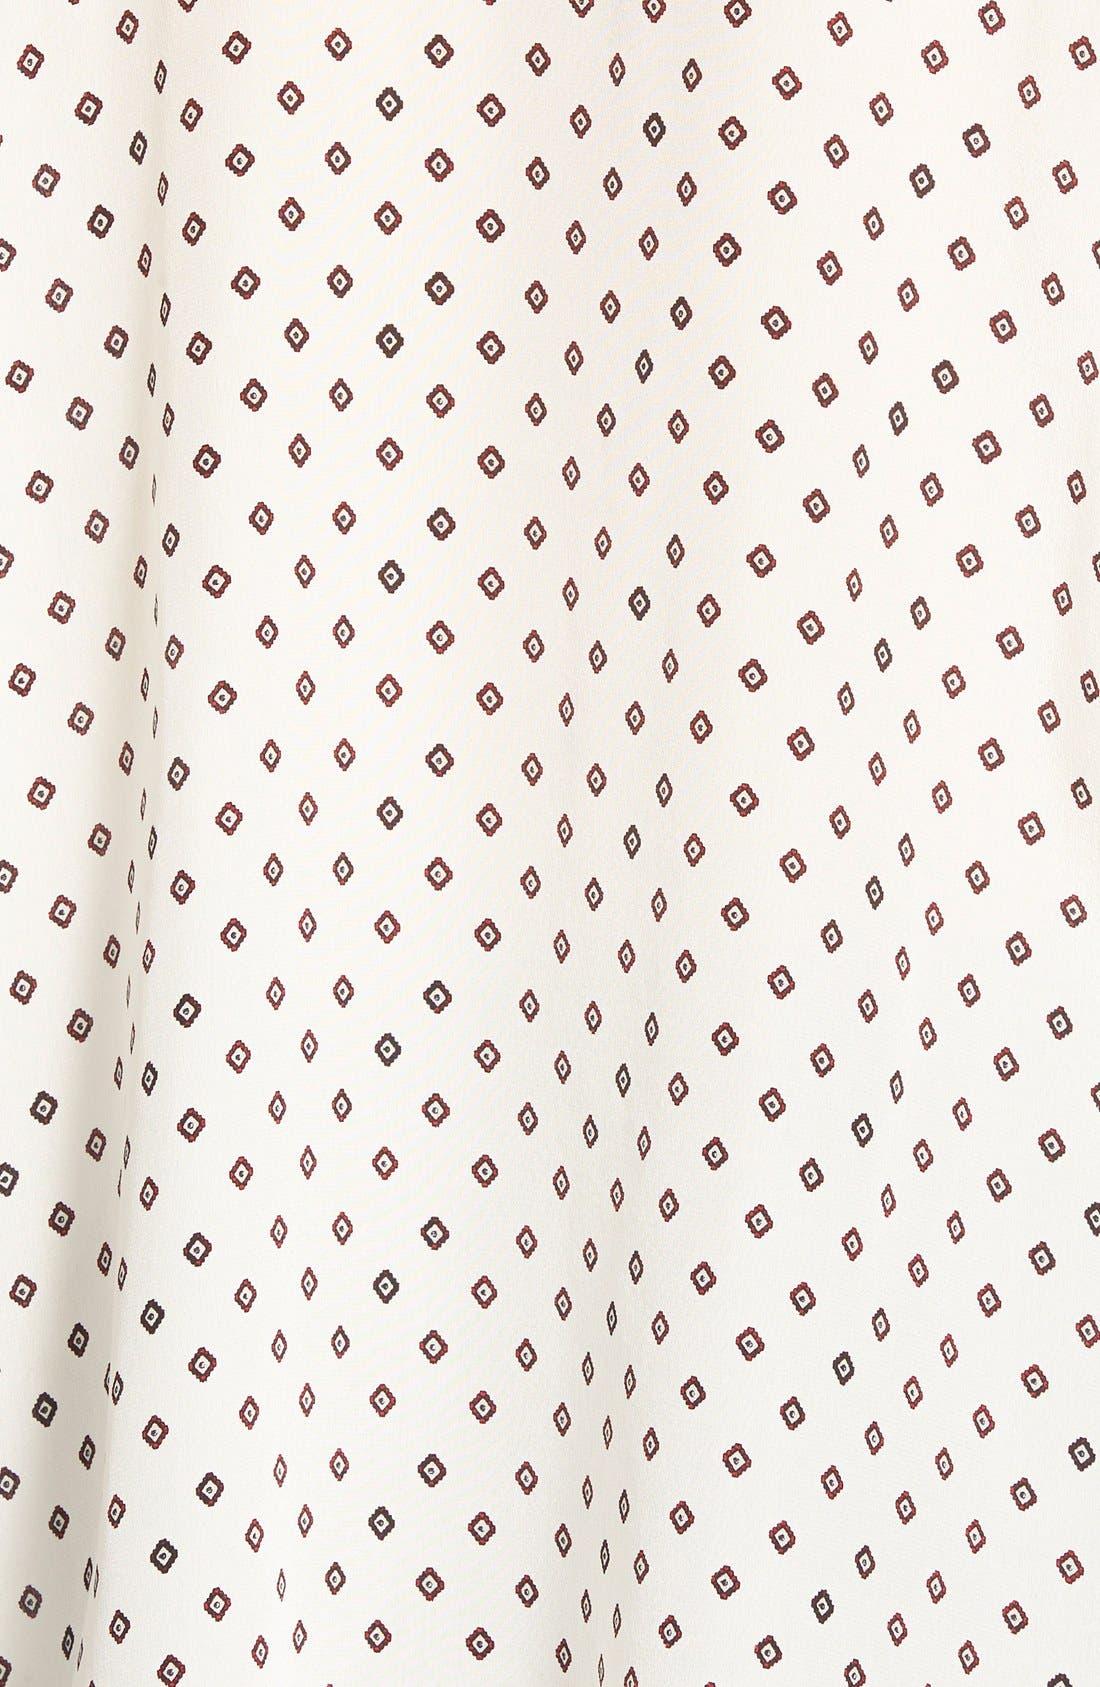 MADEWELL,                             'Foulard Dot' Silk Courier Shirt,                             Alternate thumbnail 3, color,                             900